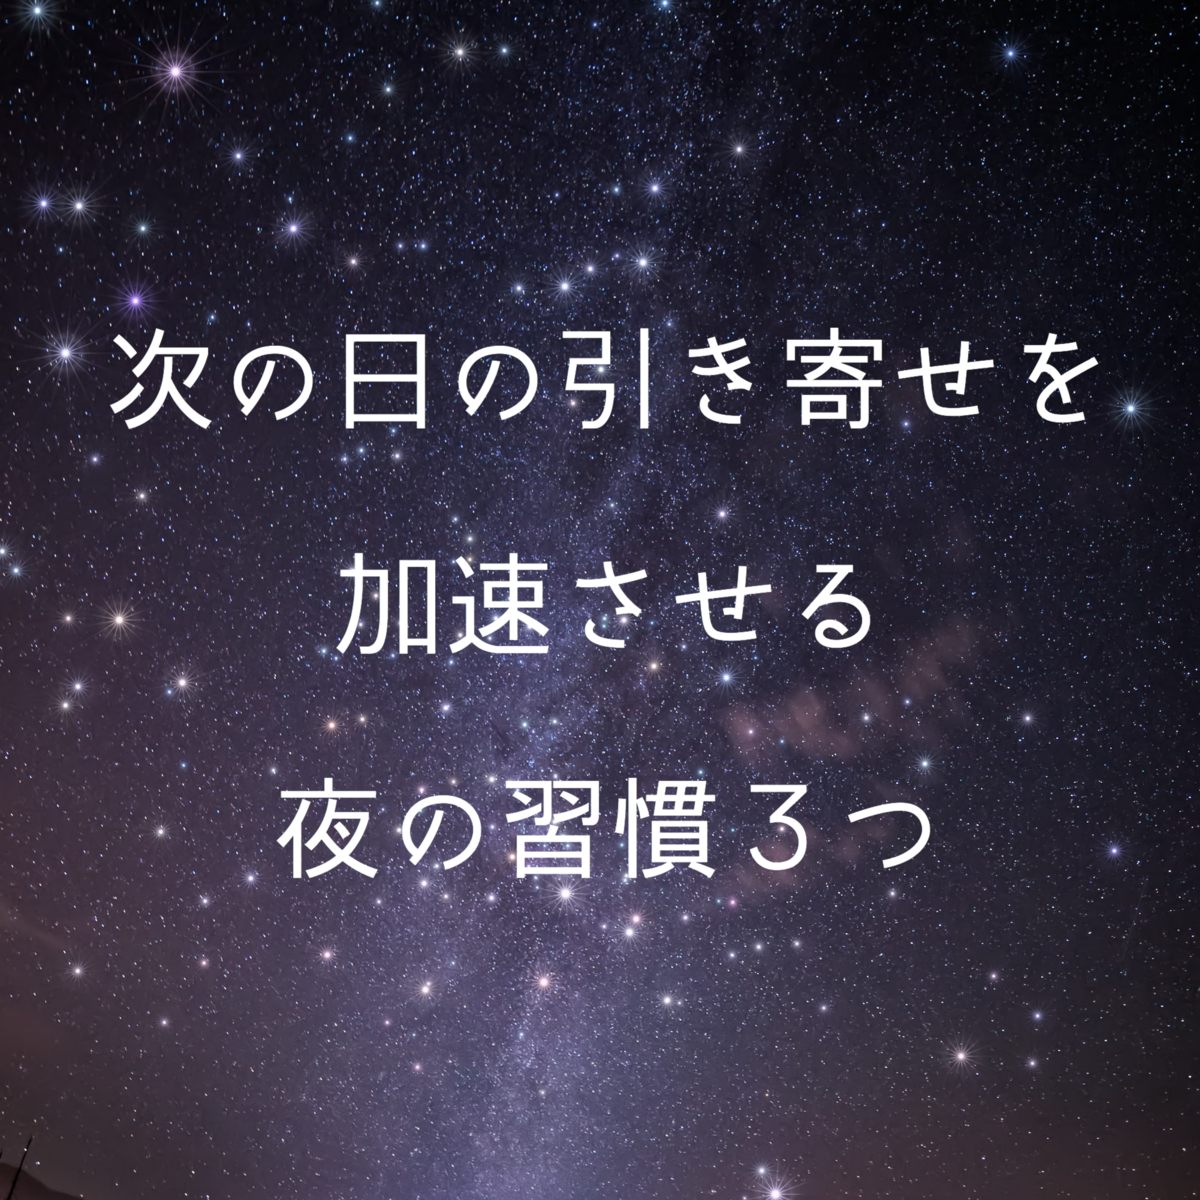 f:id:tatsunori-matsuda:20200614143308p:plain